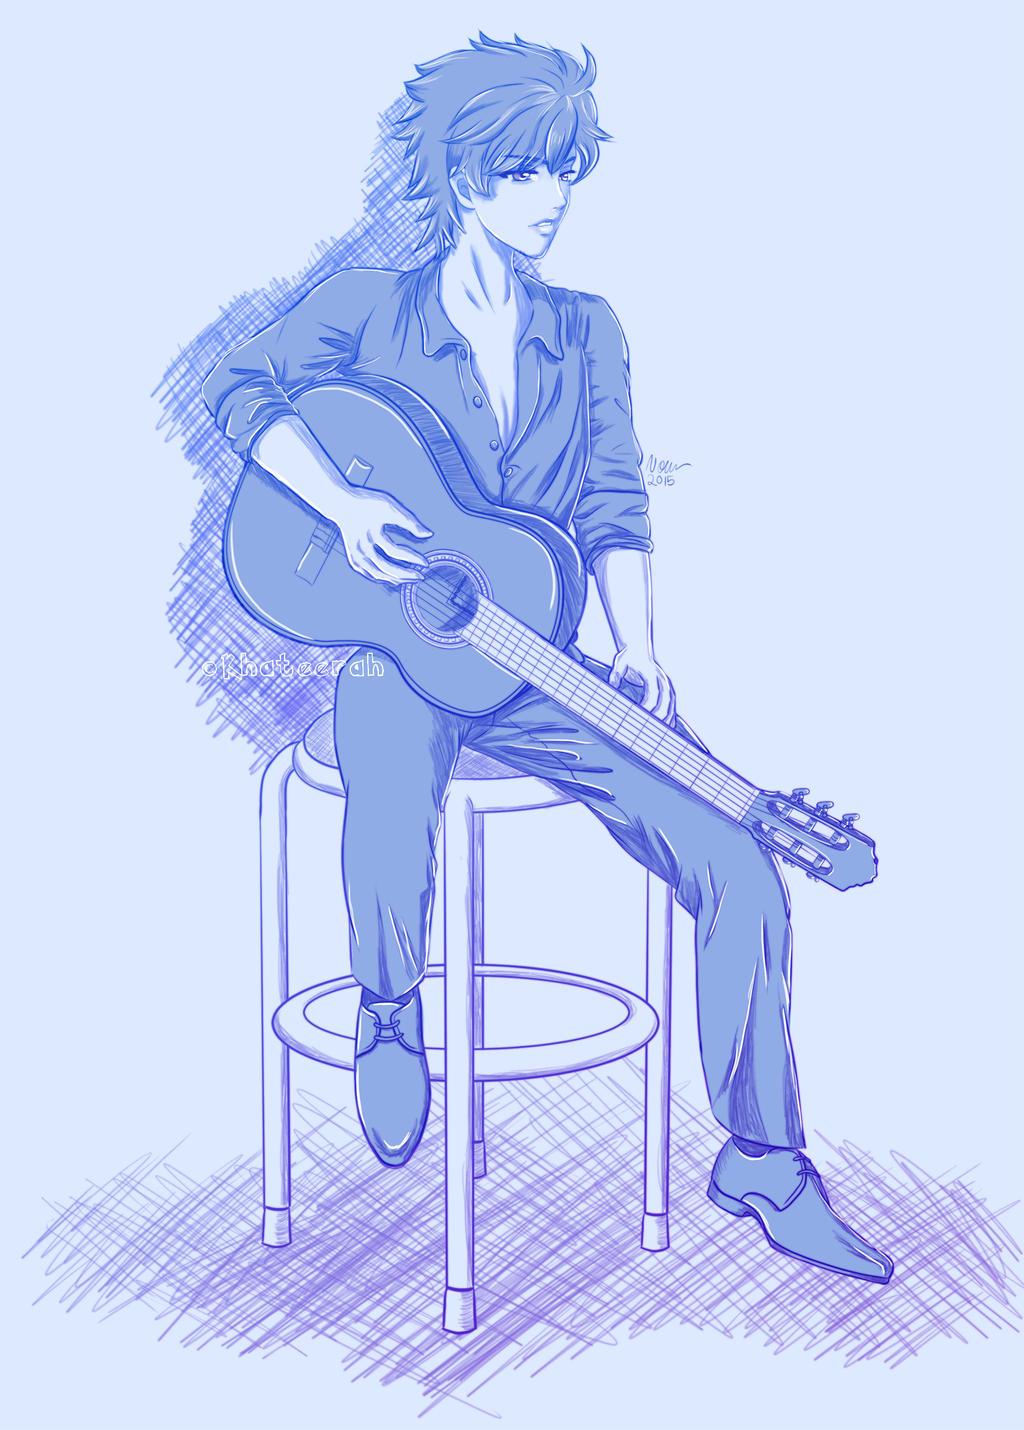 Guitar Player Sketch by Khateerah on DeviantArt